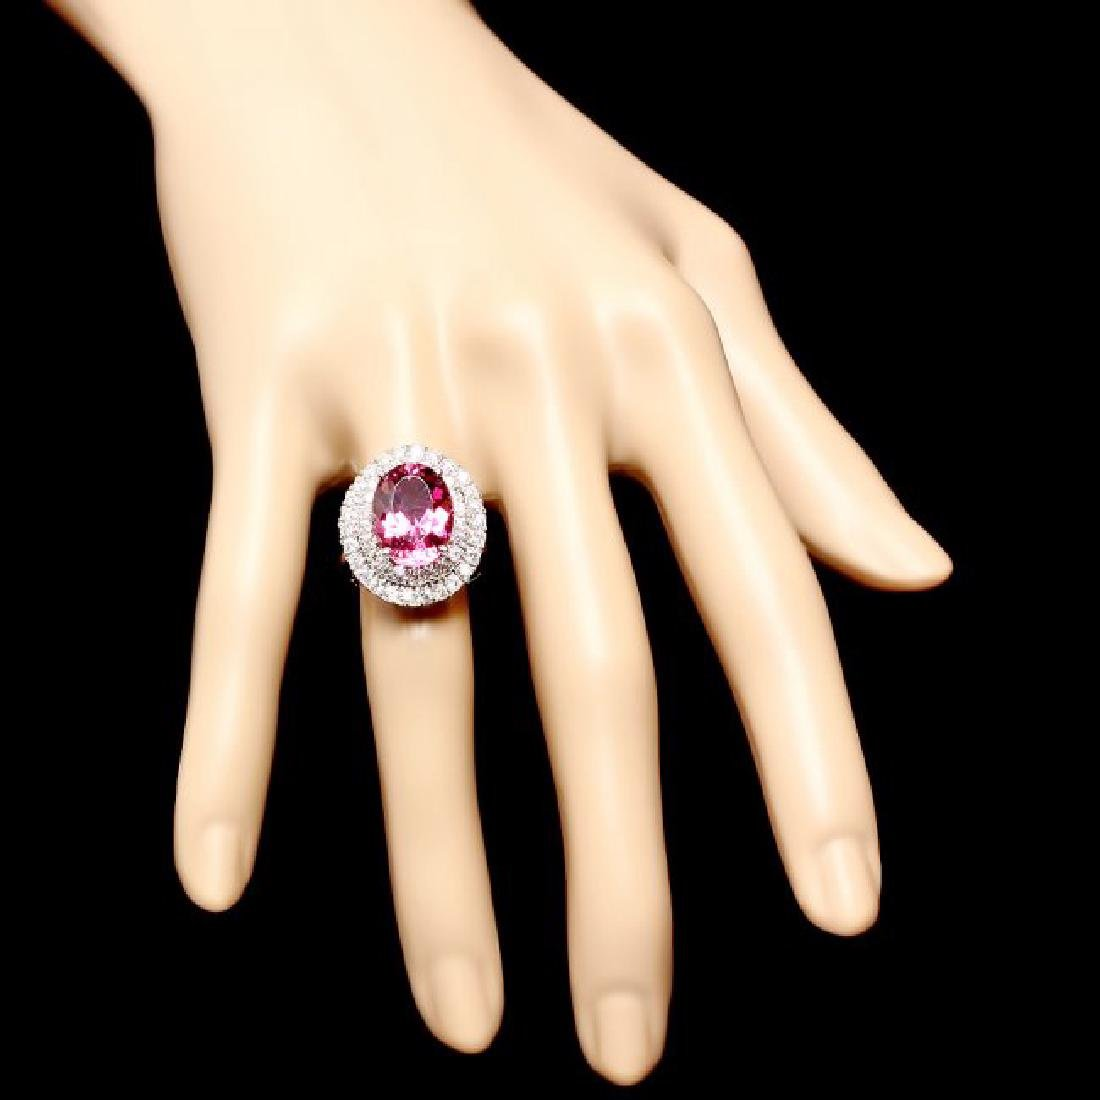 14k Gold 6.55ct Tourmaline 1.45ct Diamond Ring - 4